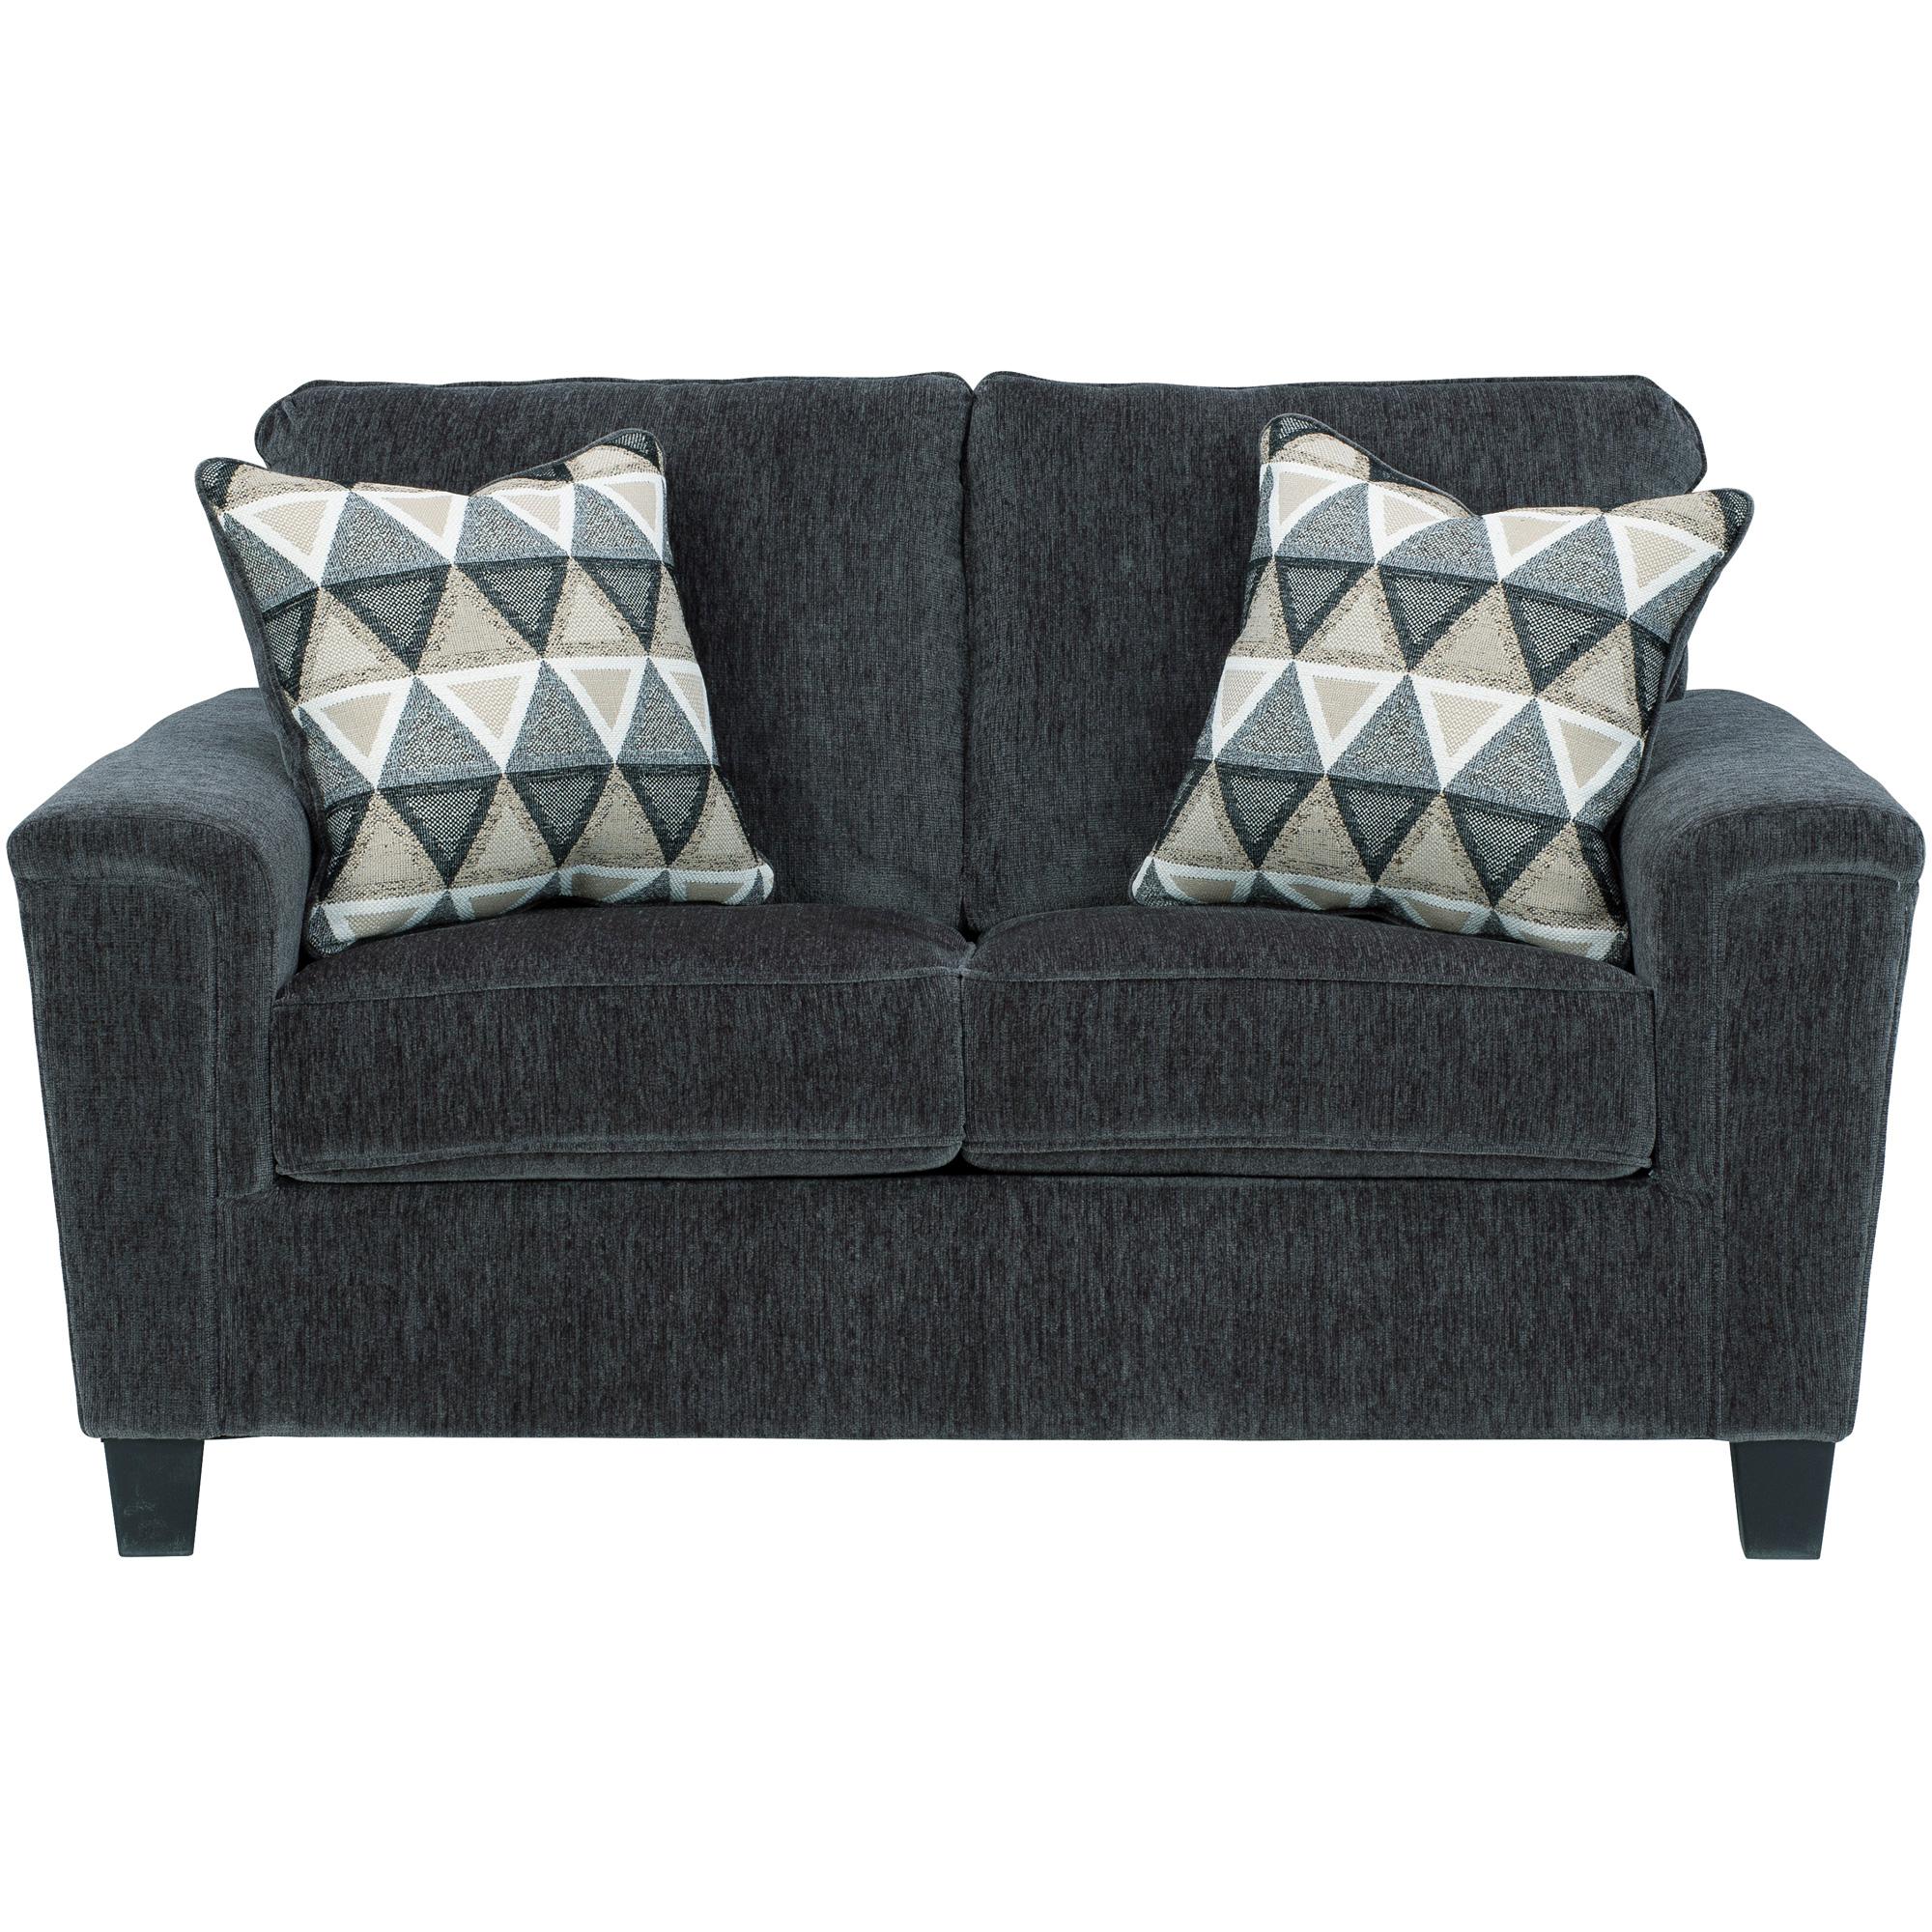 Ashley Furniture | Abinger Smoke Loveseat Sofa